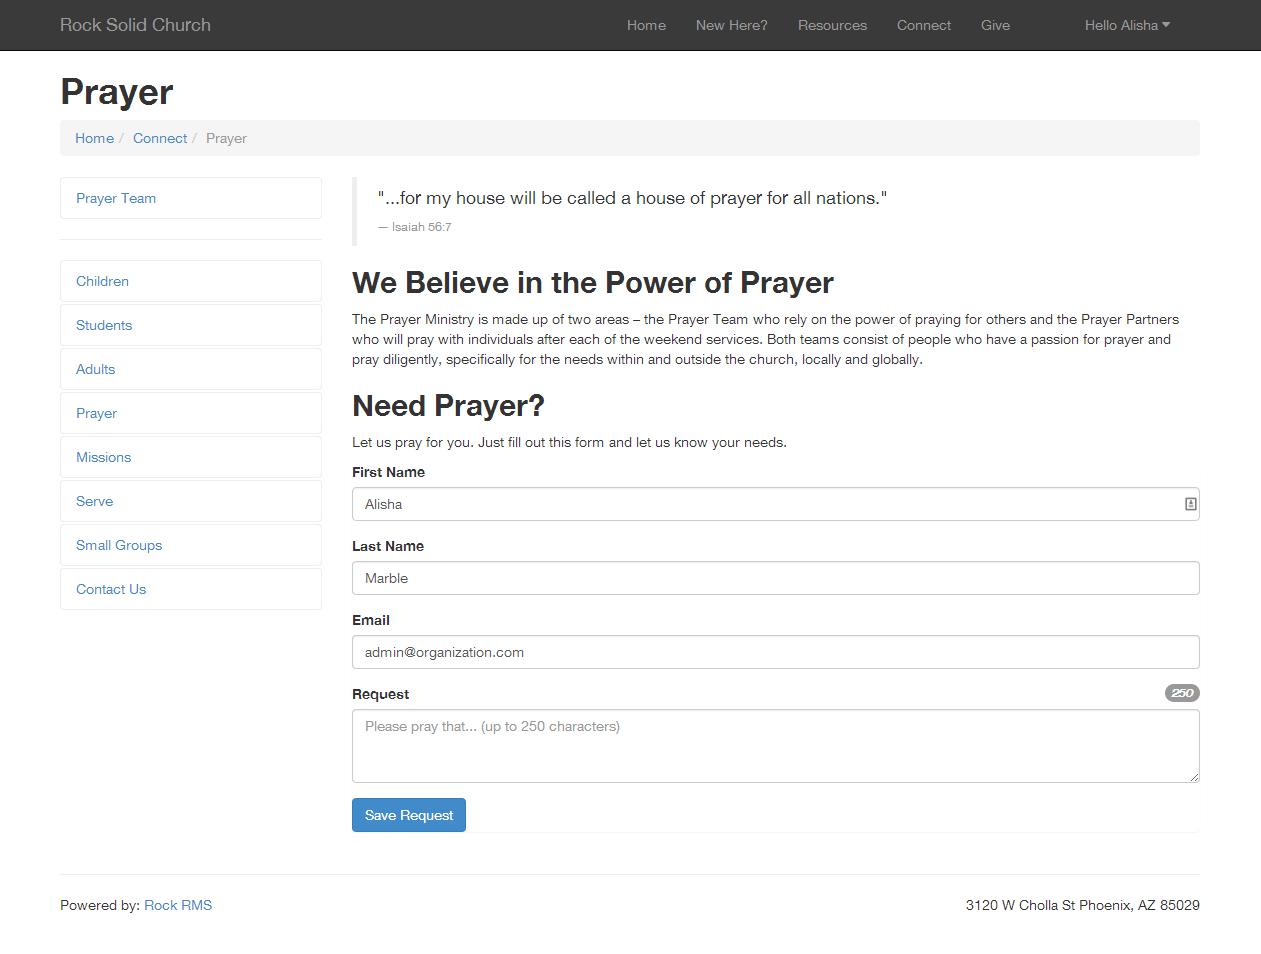 Adding a Prayer Request